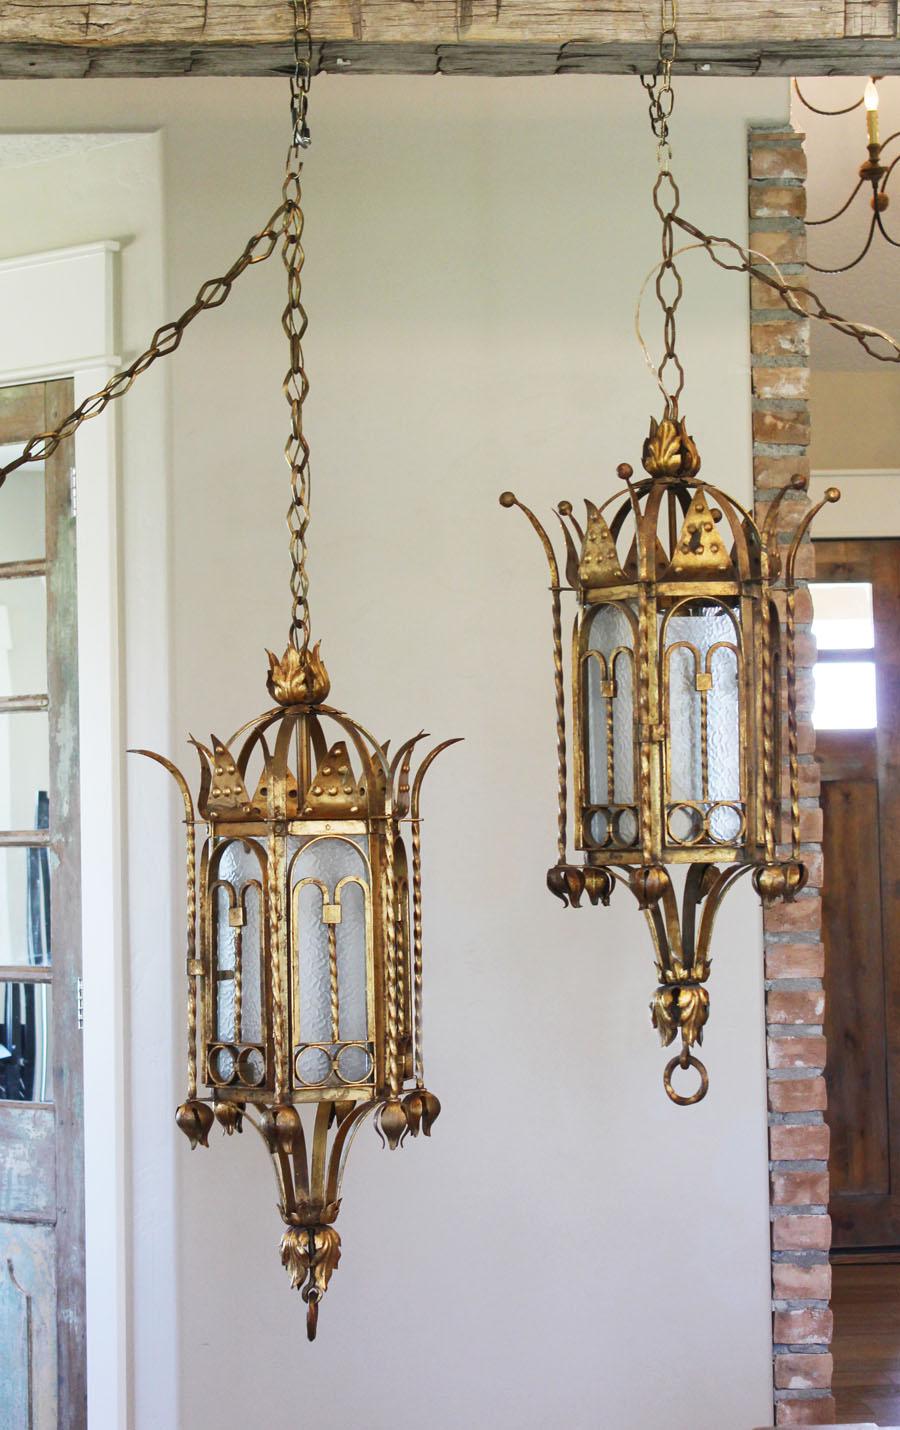 Antique Italian Huge Gilt Lantern Hanging Light Gorgeous Gothic Style